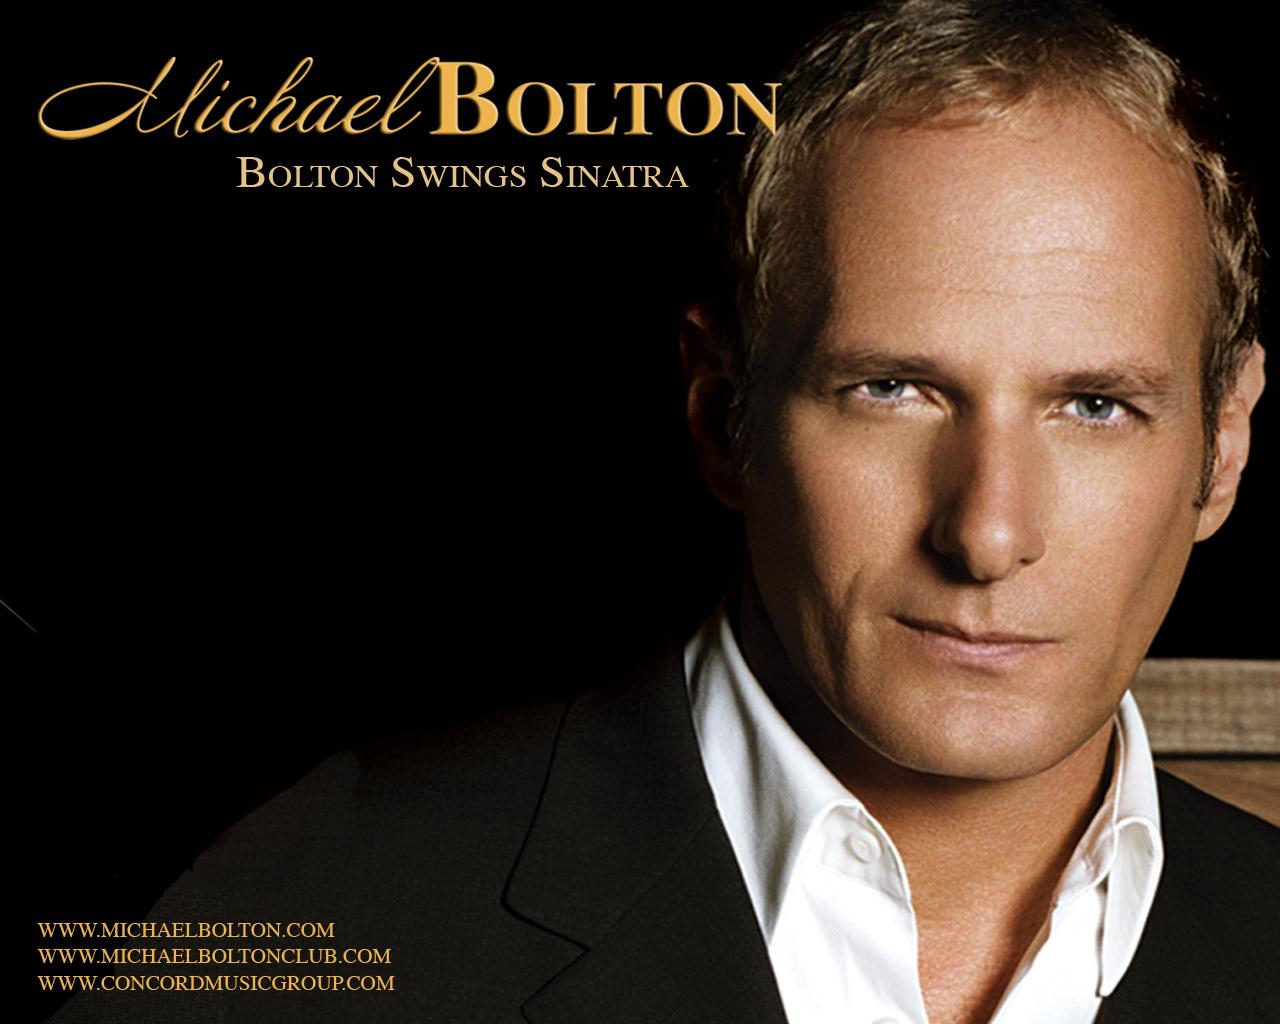 Bolton Swings Sinatra - Michael Bolton Wallpaper (25542708 ...